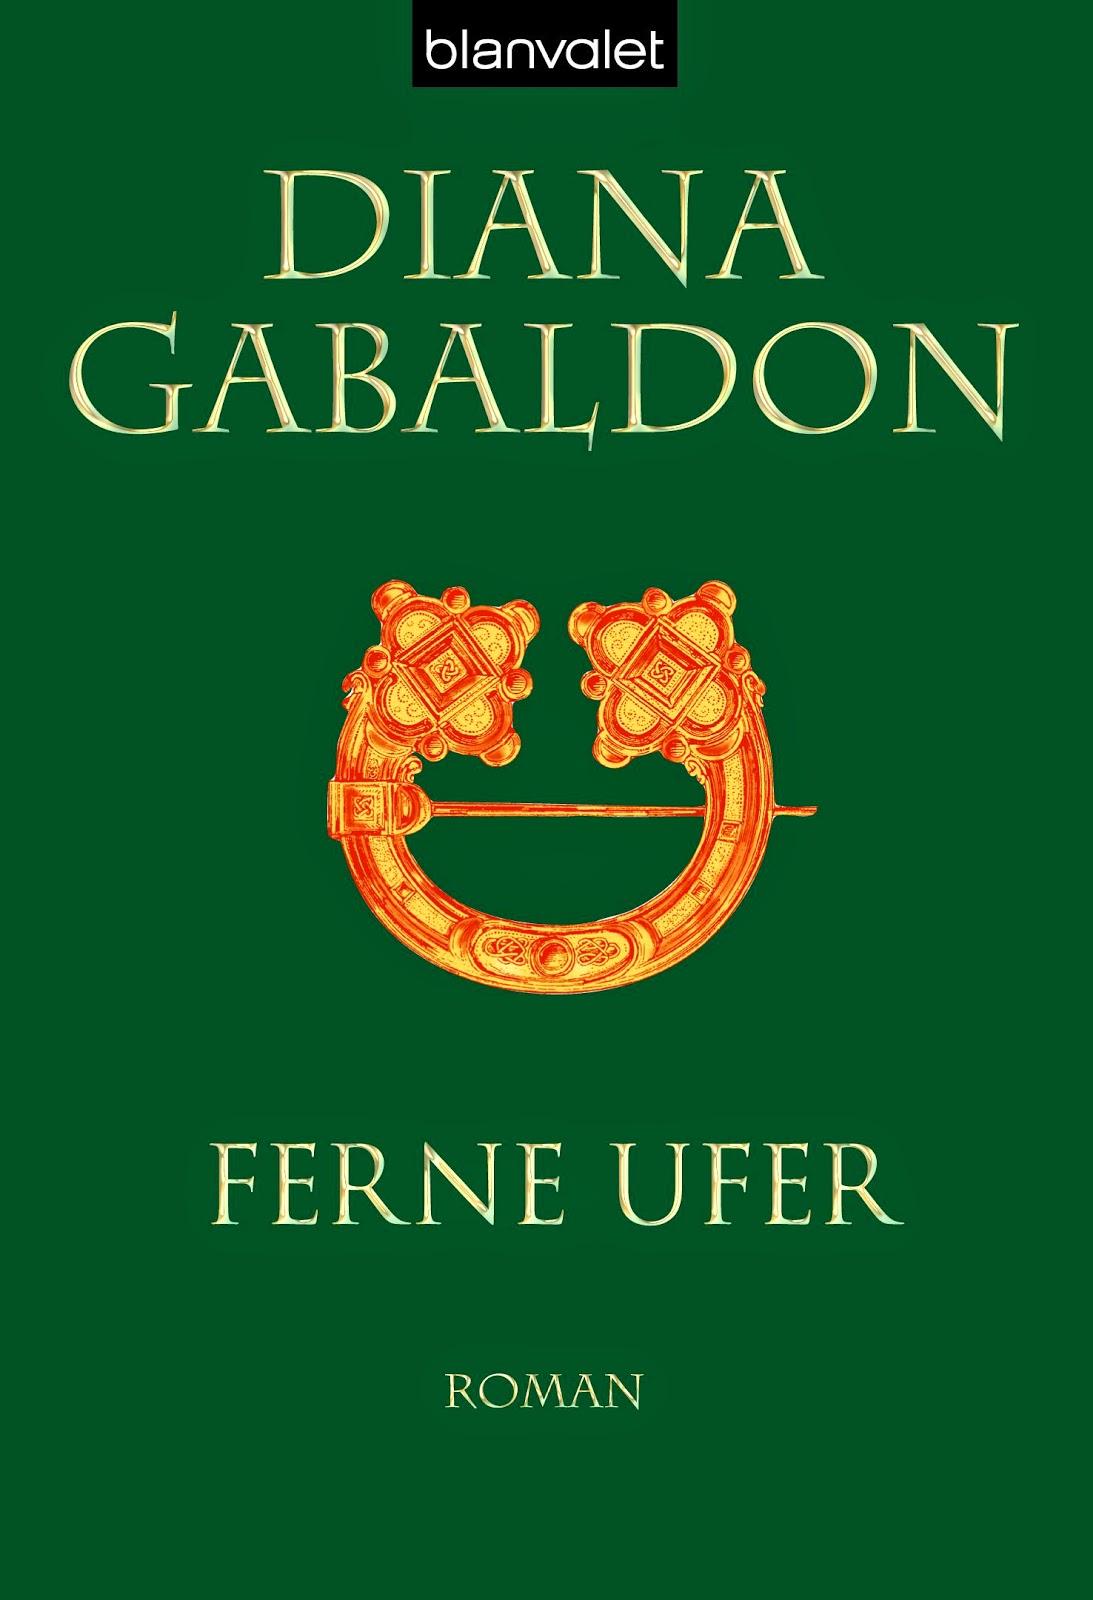 http://www.randomhouse.de/Taschenbuch/Ferne-Ufer-Roman/Diana-Gabaldon/e141432.rhd